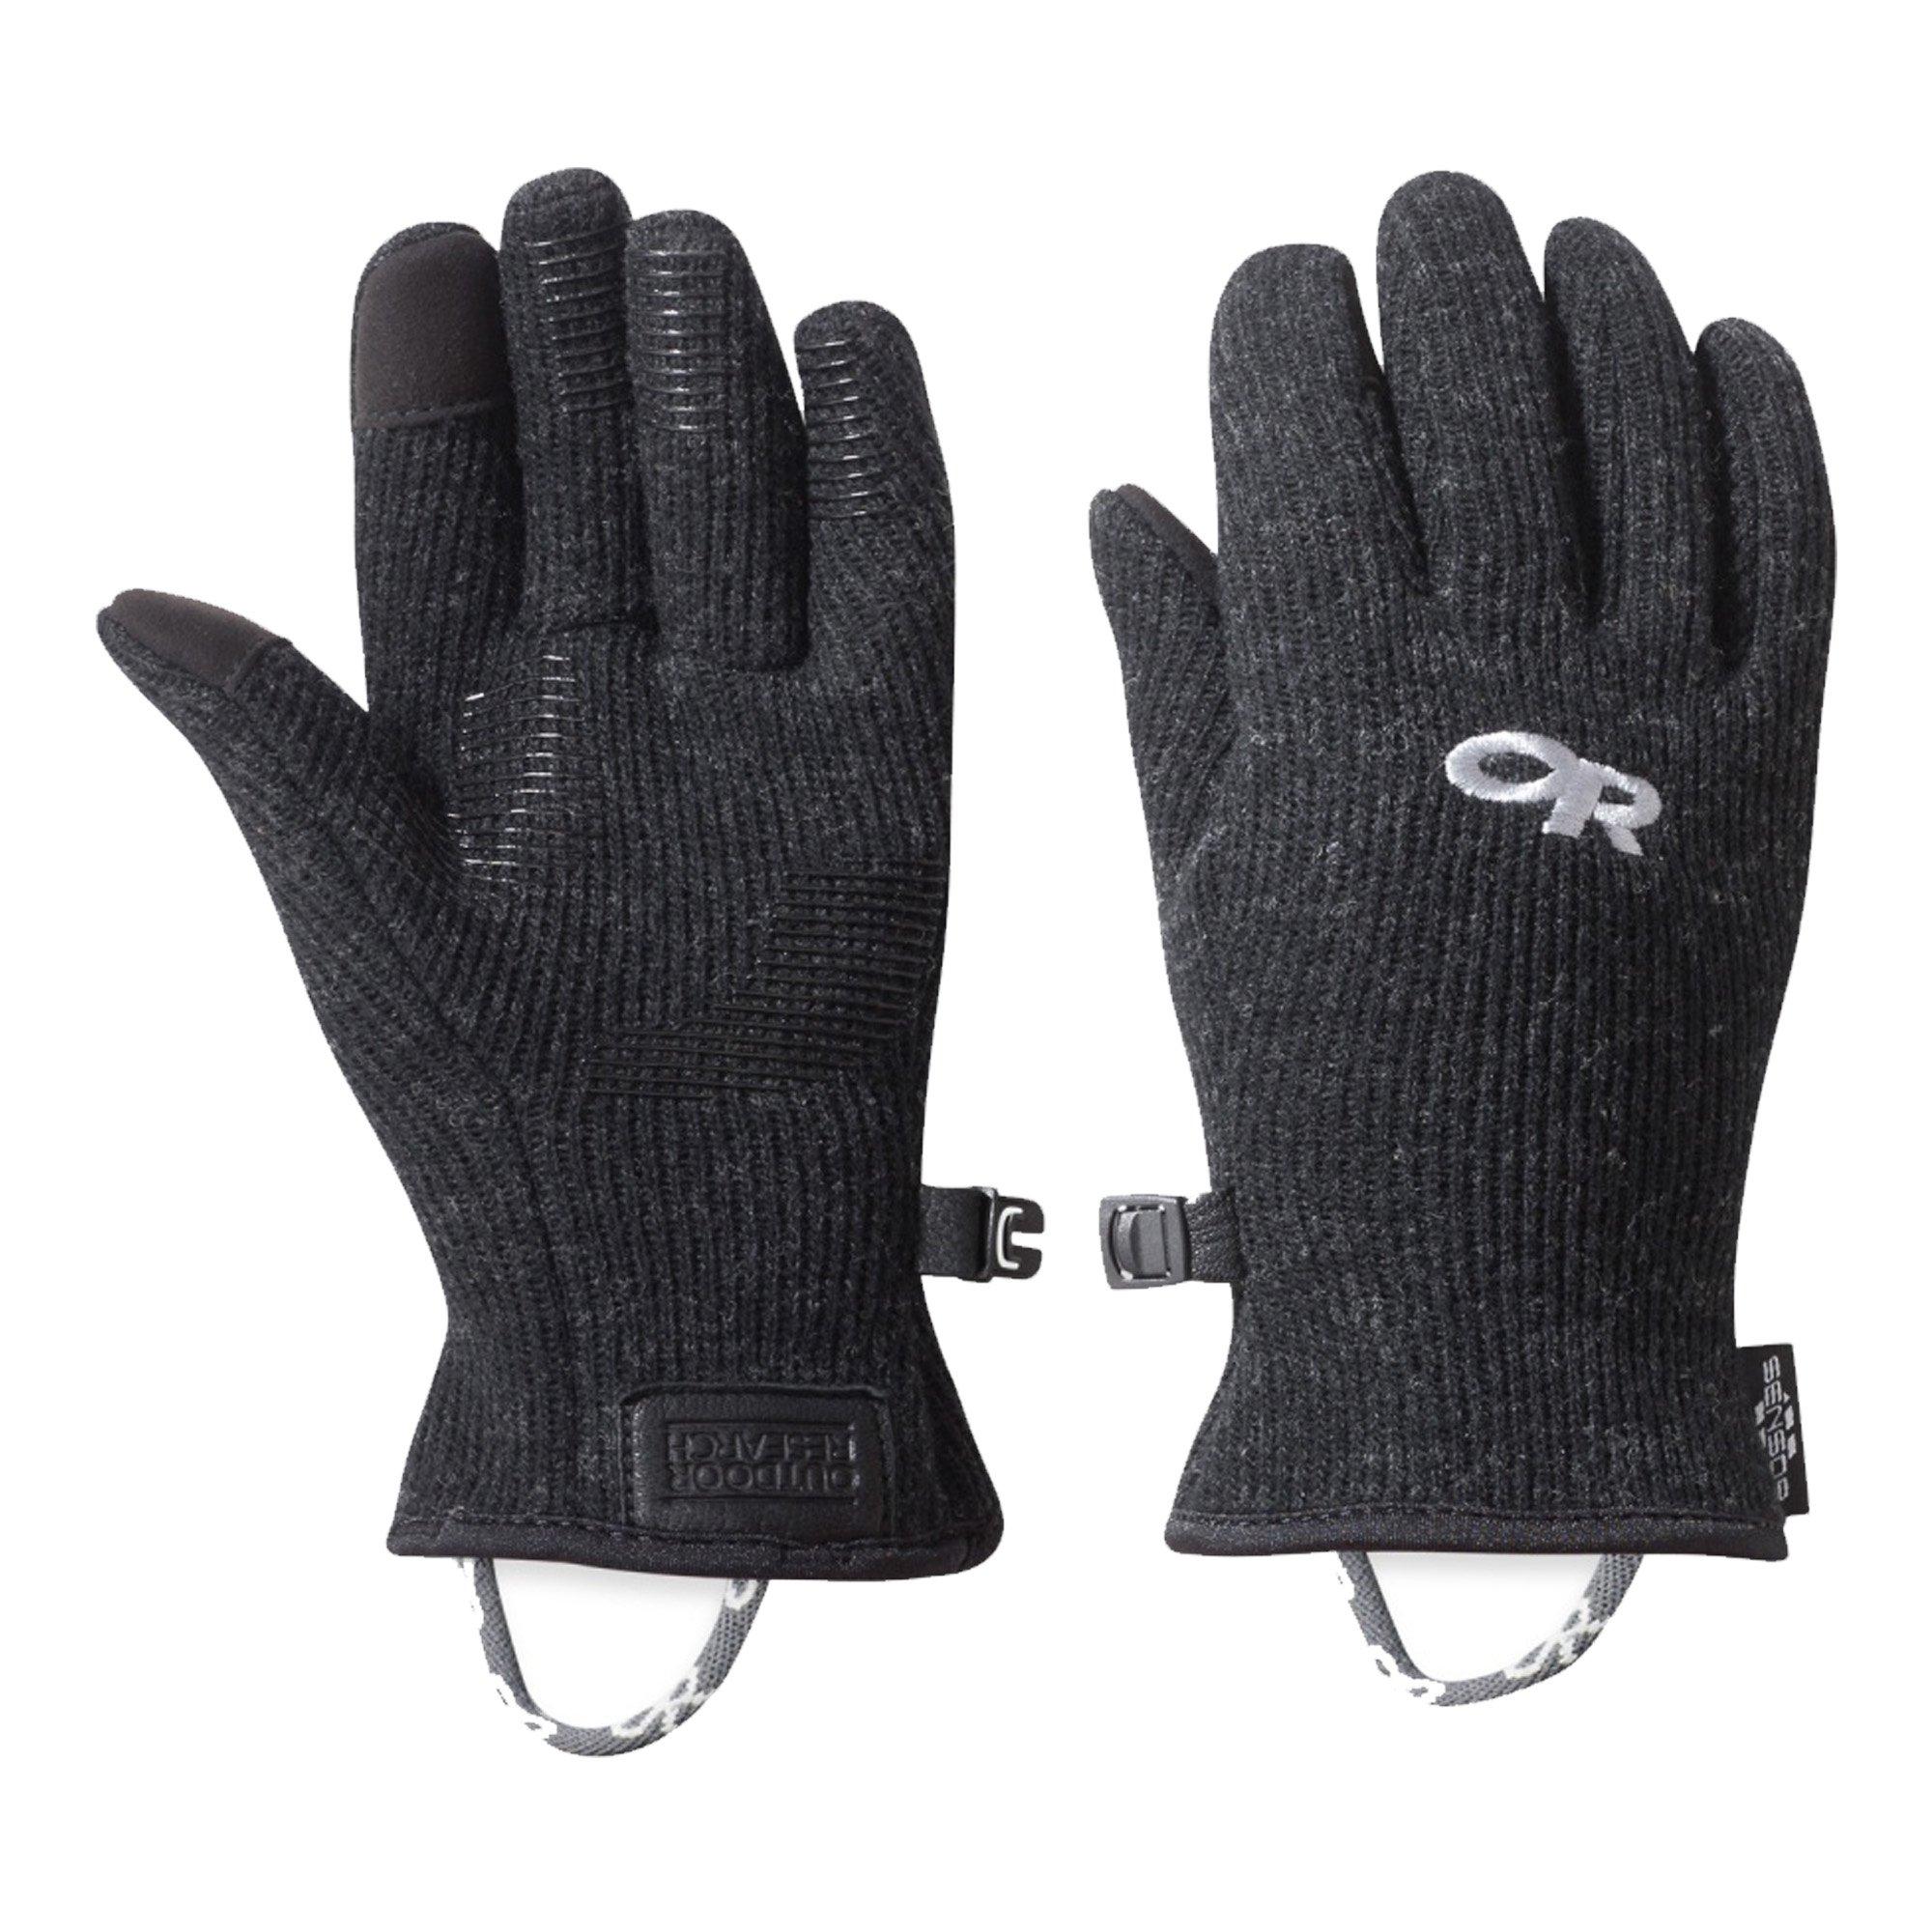 Outdoor Research Kids' Flurry Sensor Gloves, Black, Large